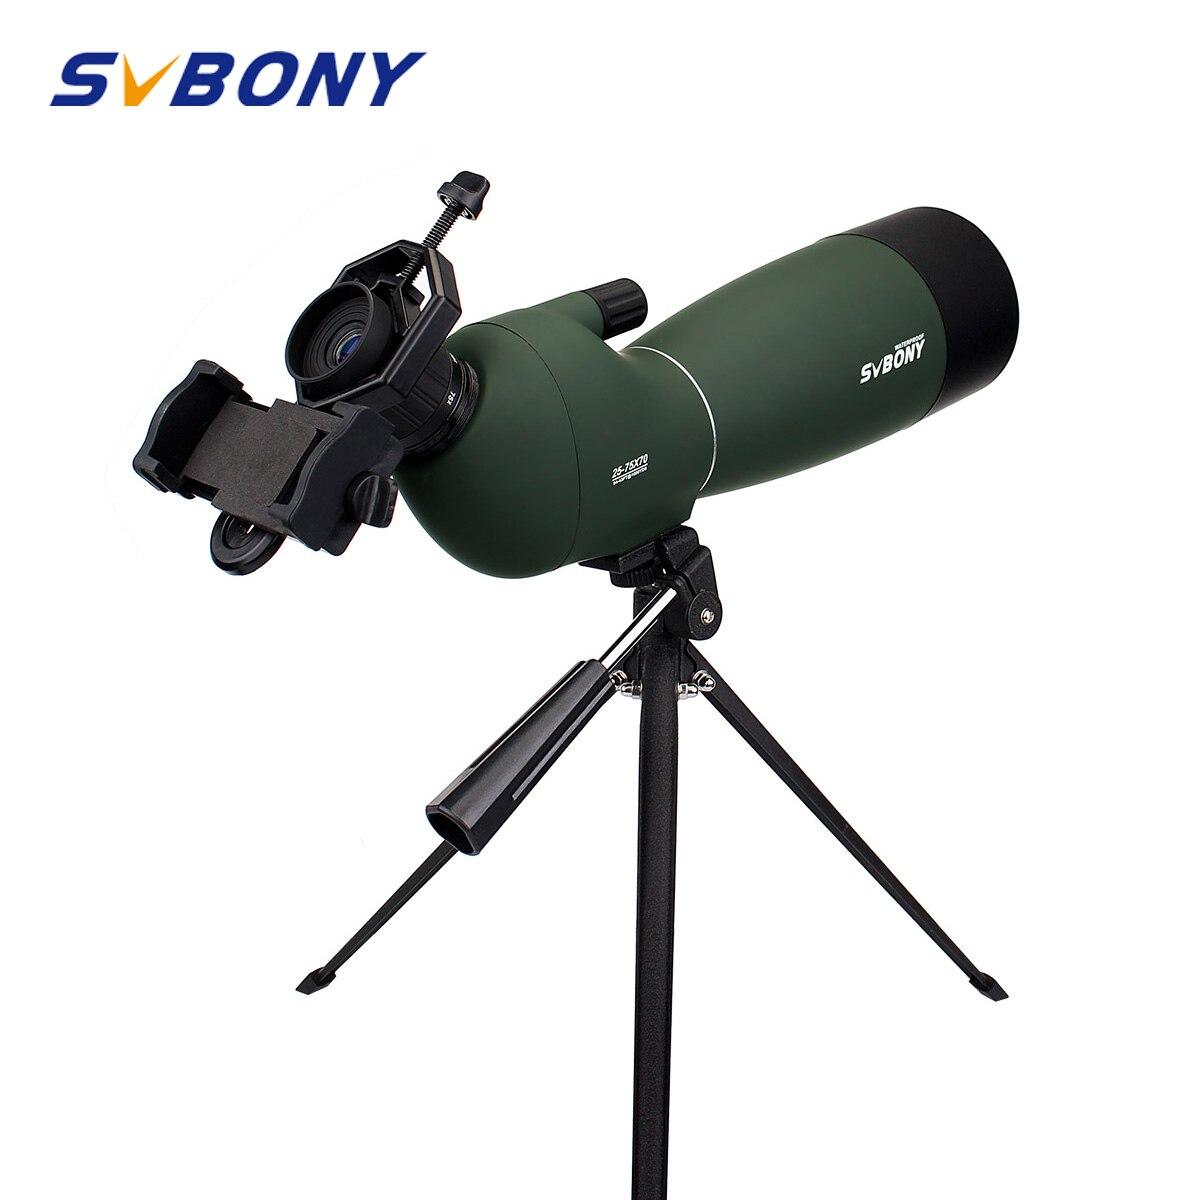 Svbony SV28 50/60/70mm Telescope Zoom Spotting Scope Waterproof Monocular W/ Universal Phone Adapter Mount For Hunting F9308